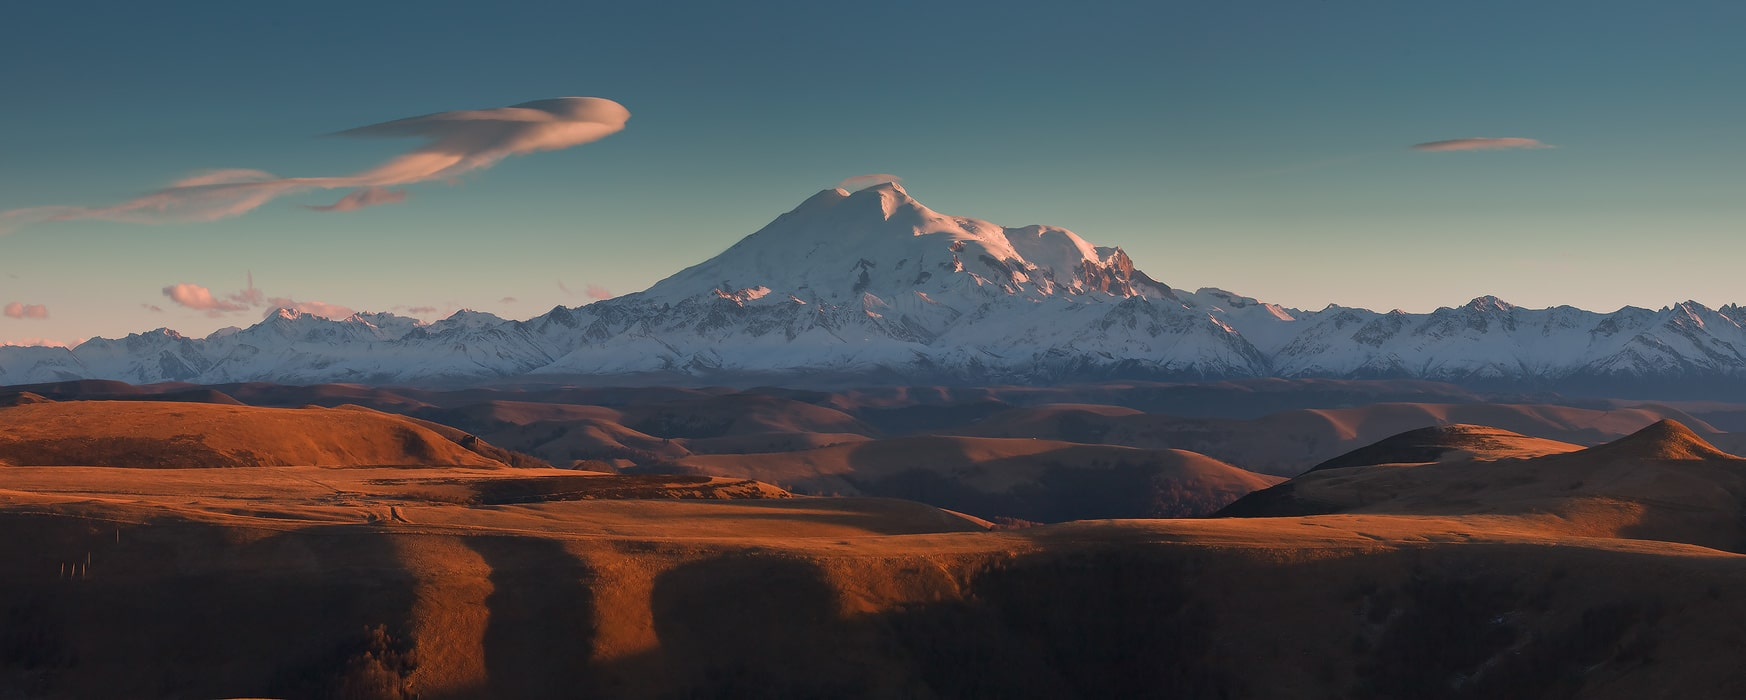 mount-elbrus-the-volcano-on-caucasus-secret-world